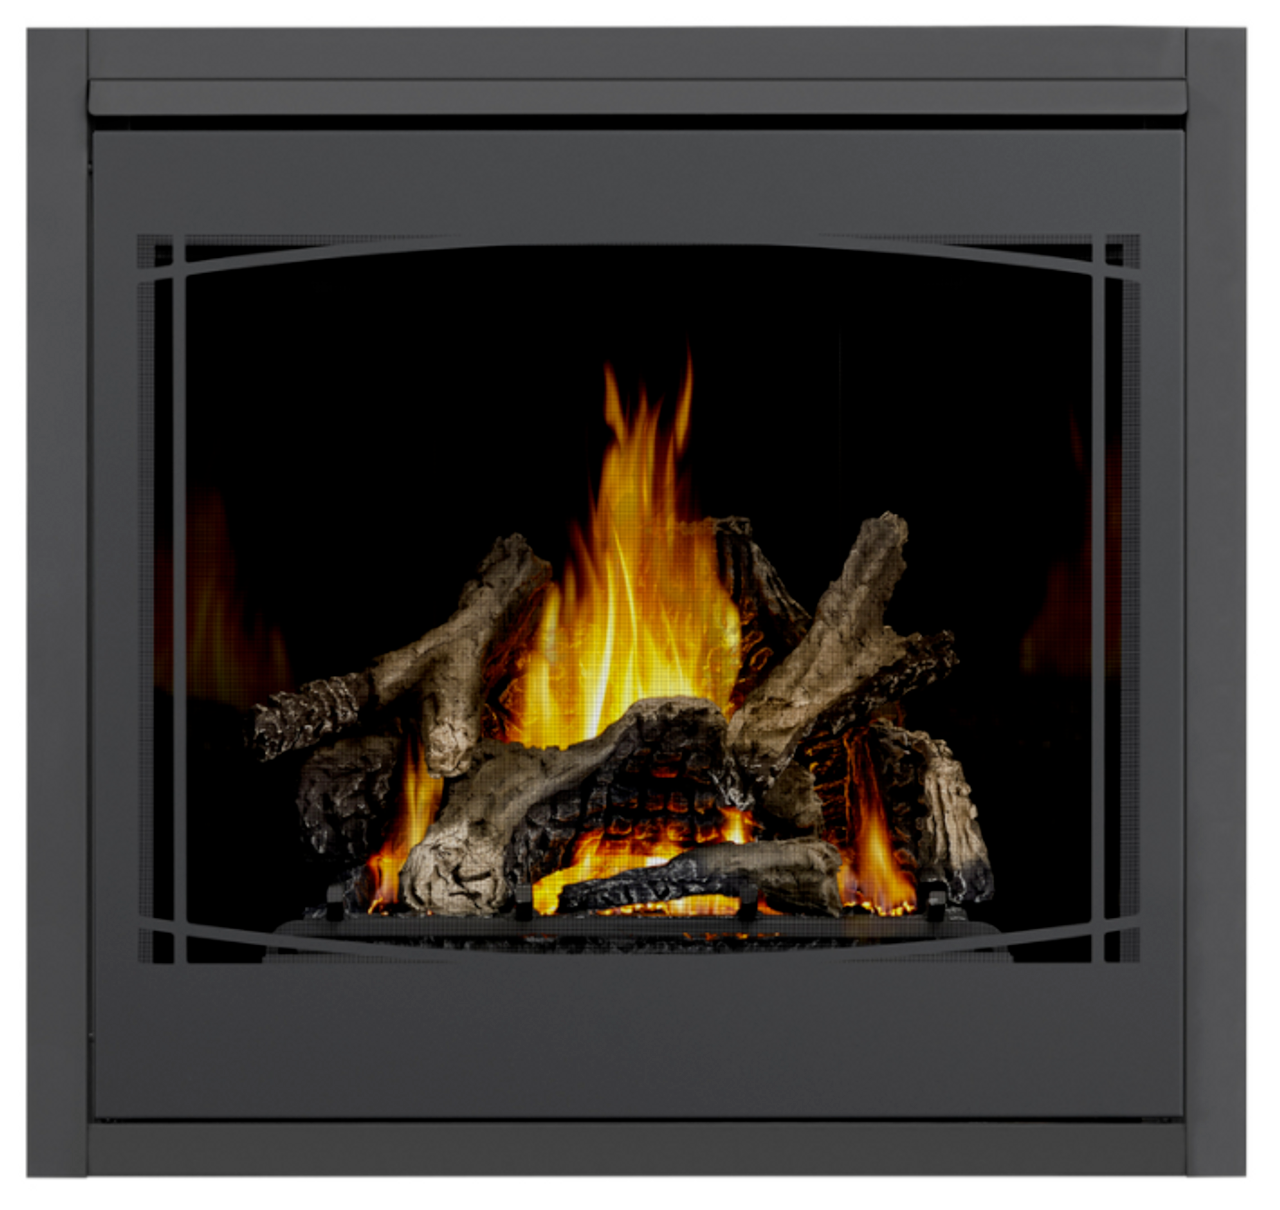 PHAZER Logs, MIRRO-FLAME Porcelain Reflective Radiant Panels, Zen Front